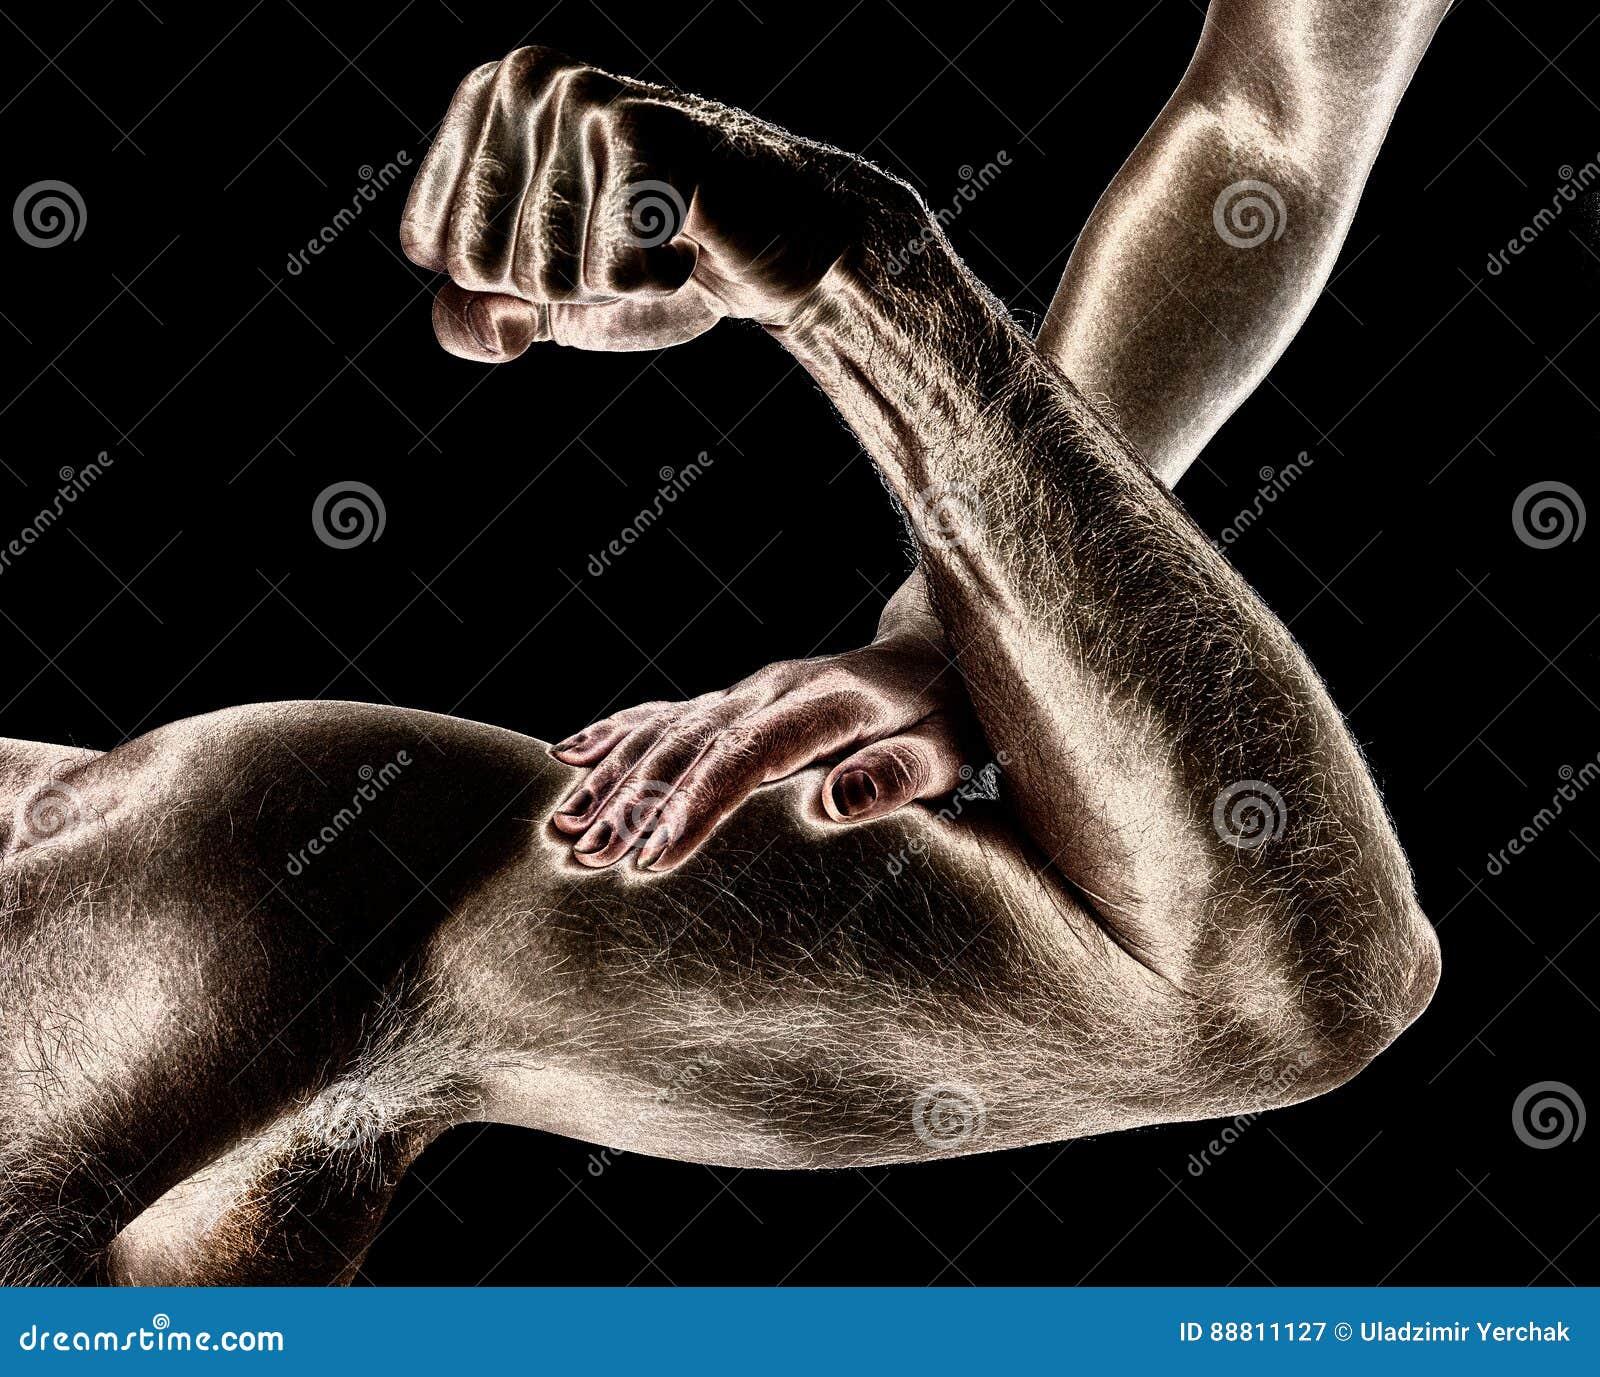 What touches a man